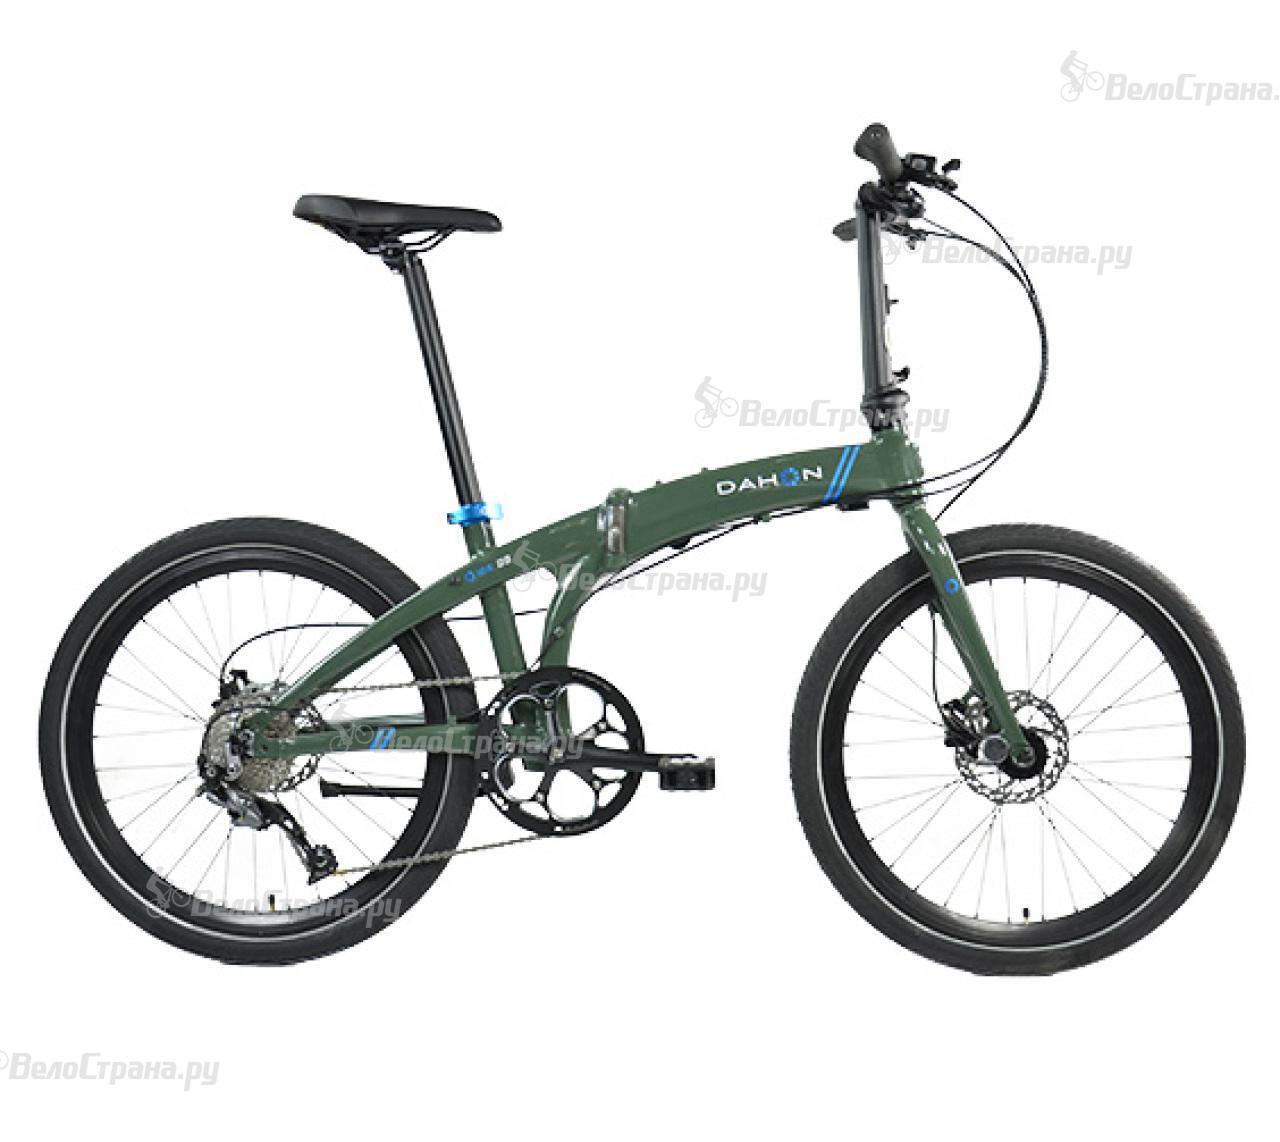 Велосипед Dahon IOS D9 (2017) велосипед dahon speed d7 2014